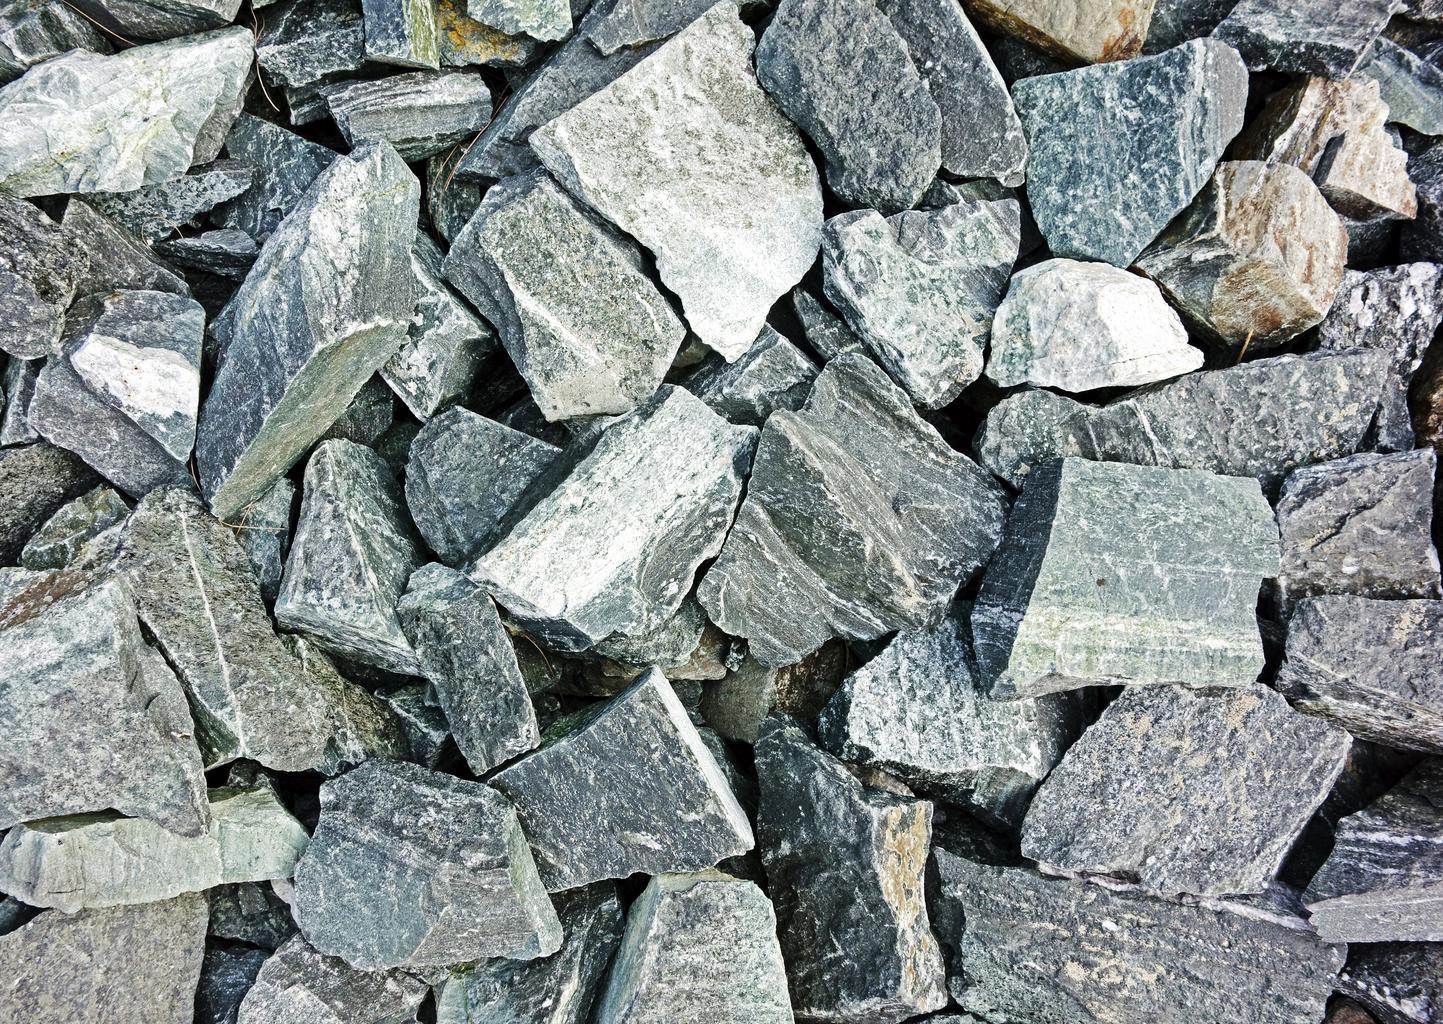 quarried mining rocks